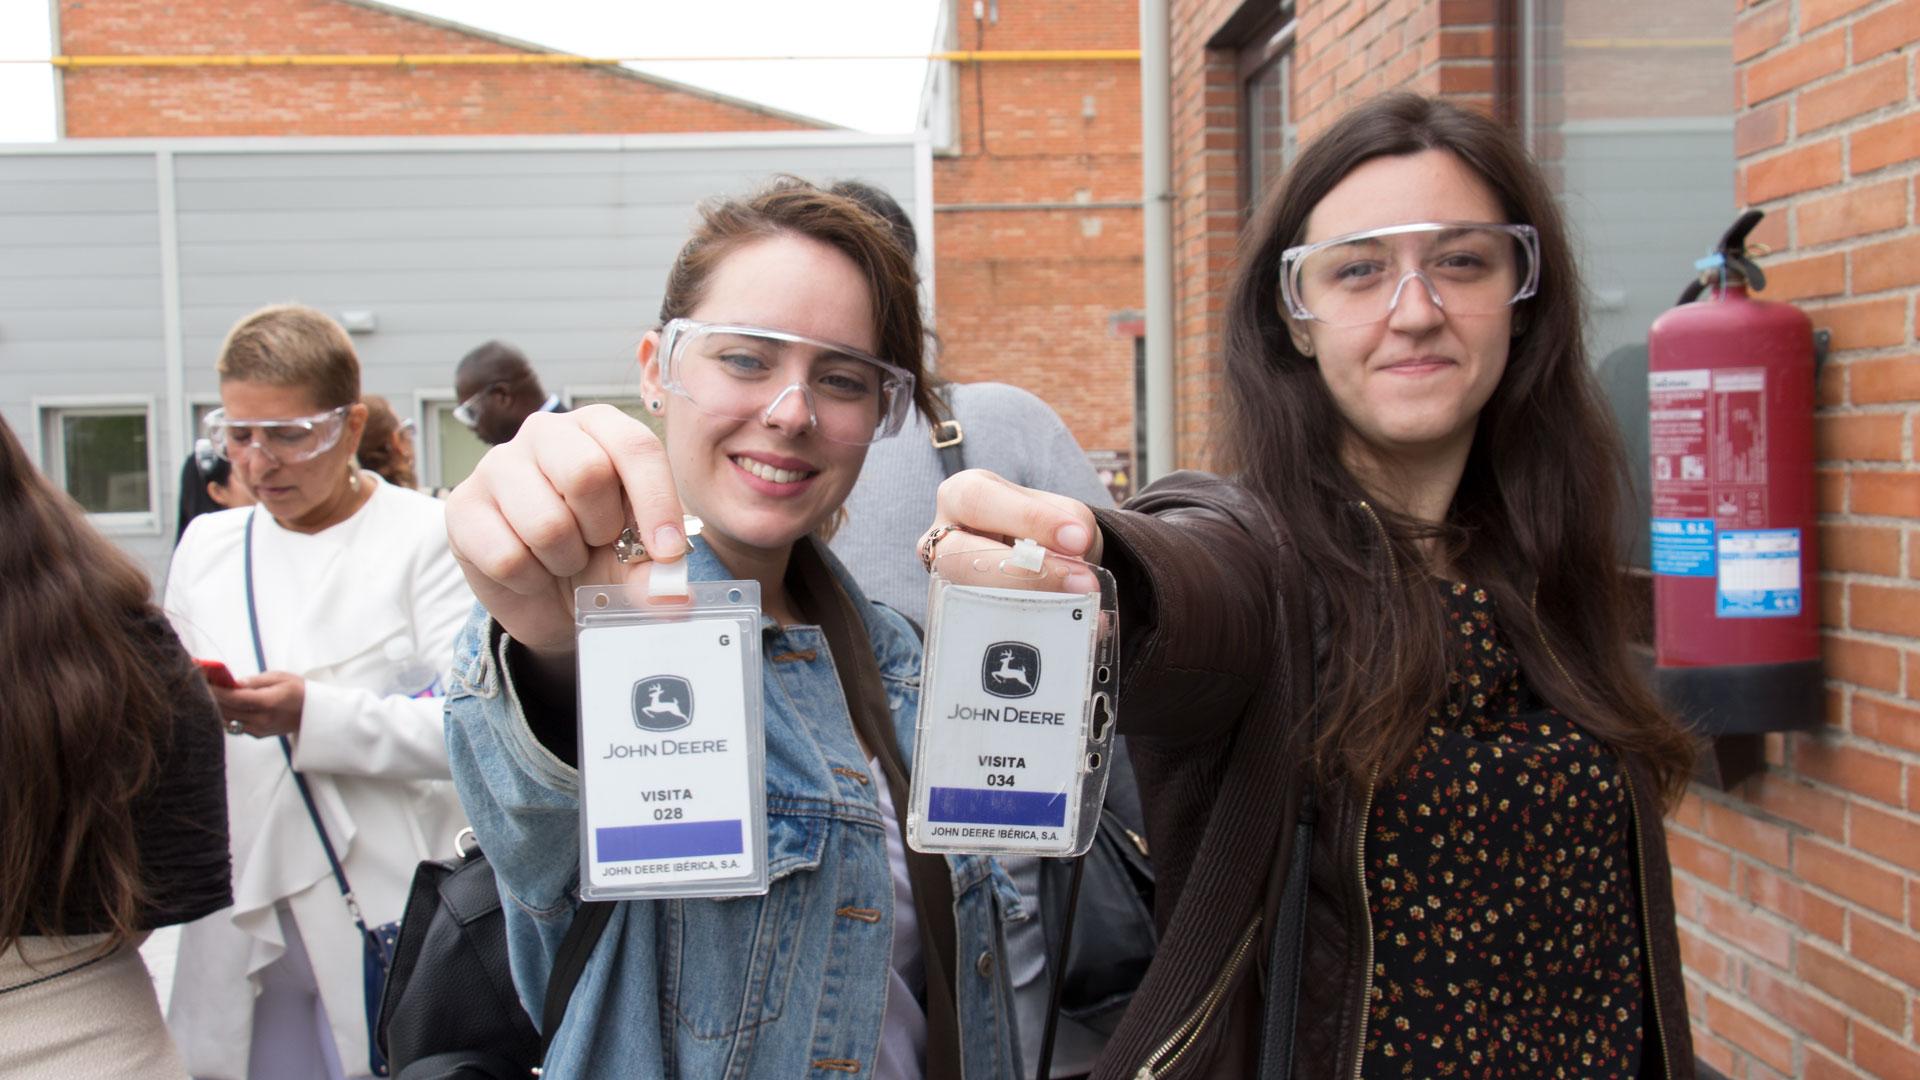 970x90-Guia-Linkedin John Deere abre las puertas de su fábrica a alumnos de IMF Business School